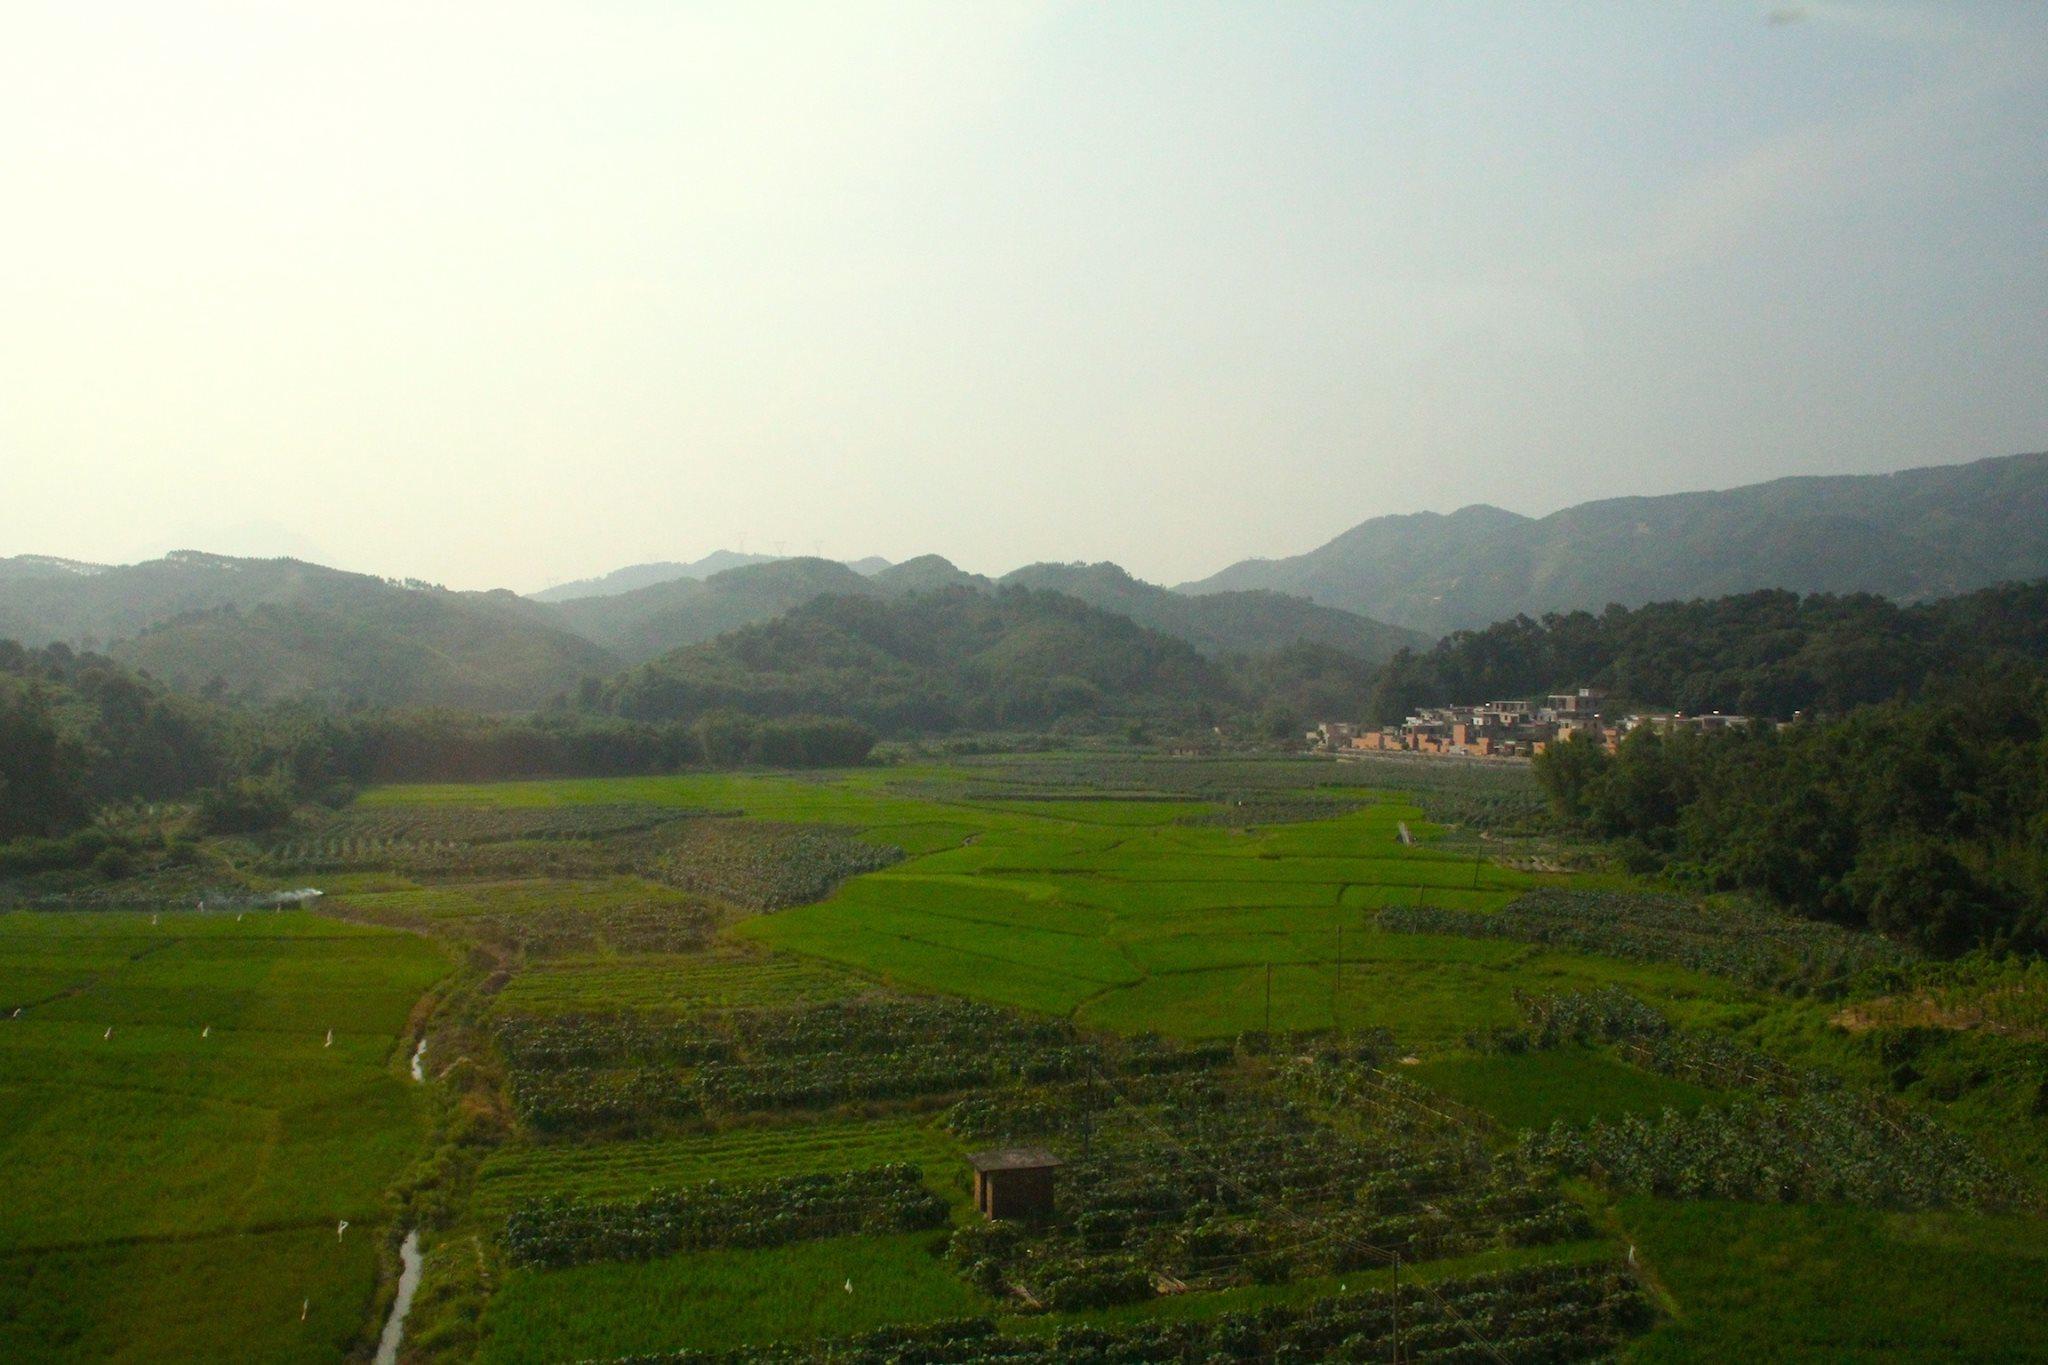 Hunan province.